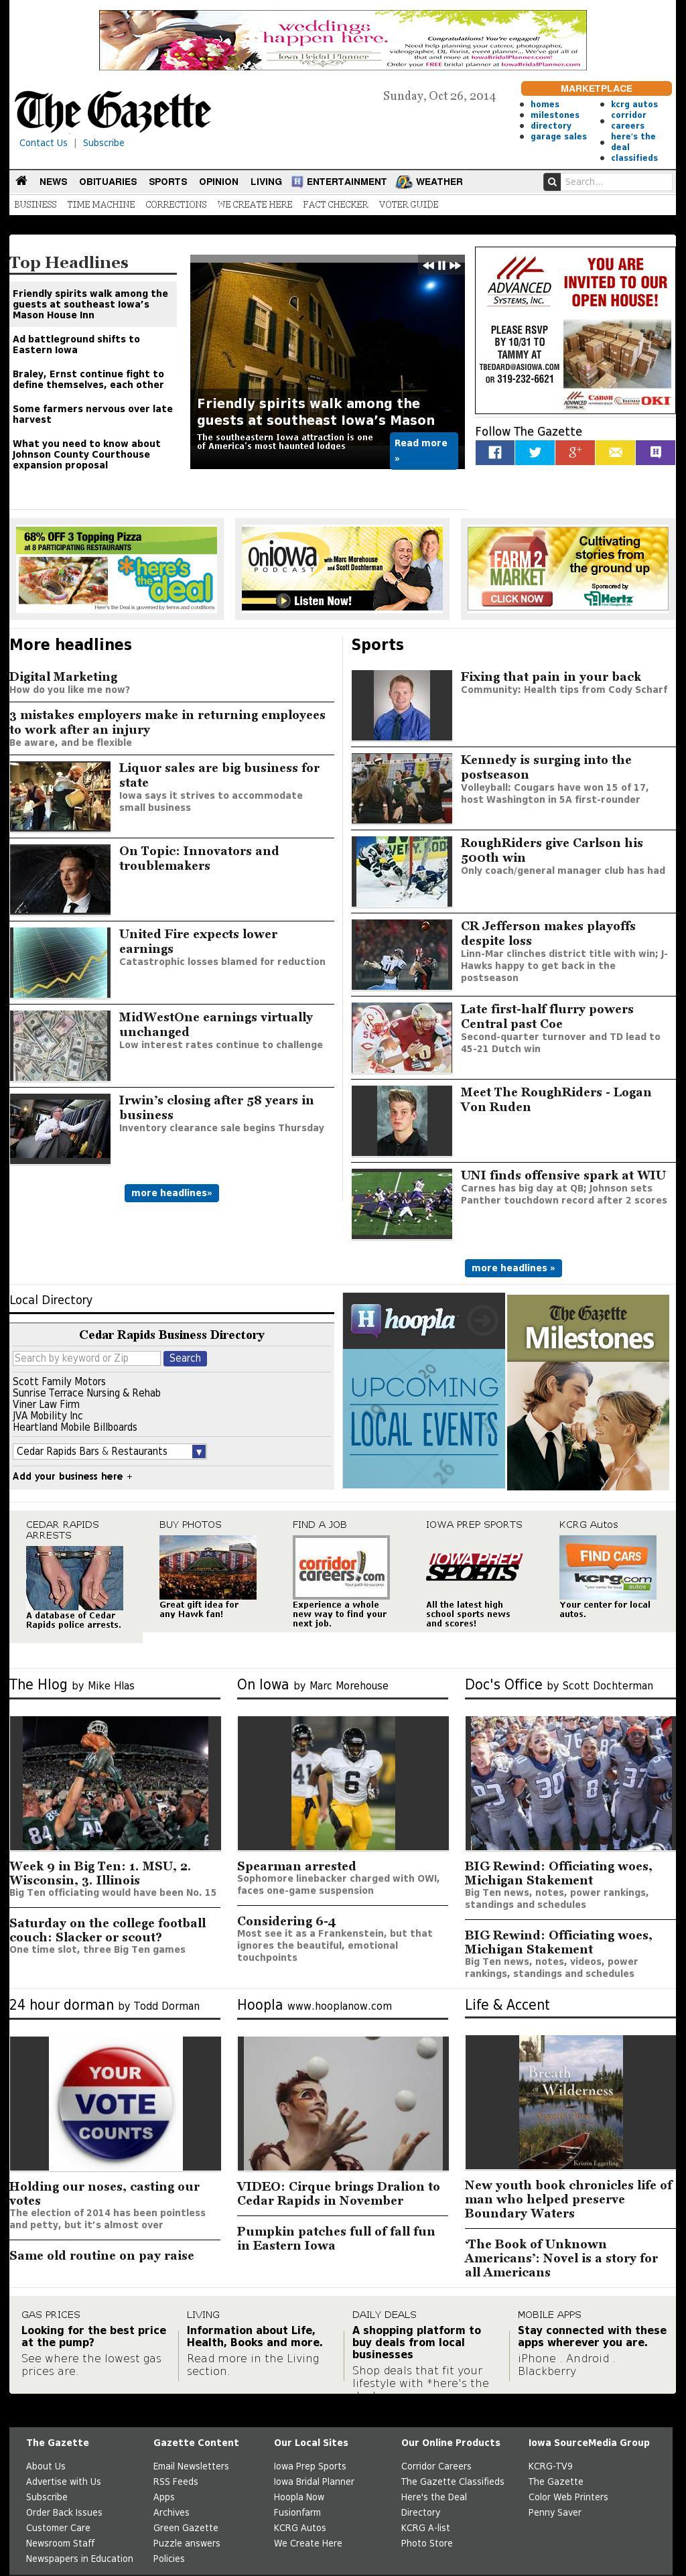 The (Cedar Rapids) Gazette at Sunday Oct. 26, 2014, 9:06 p.m. UTC